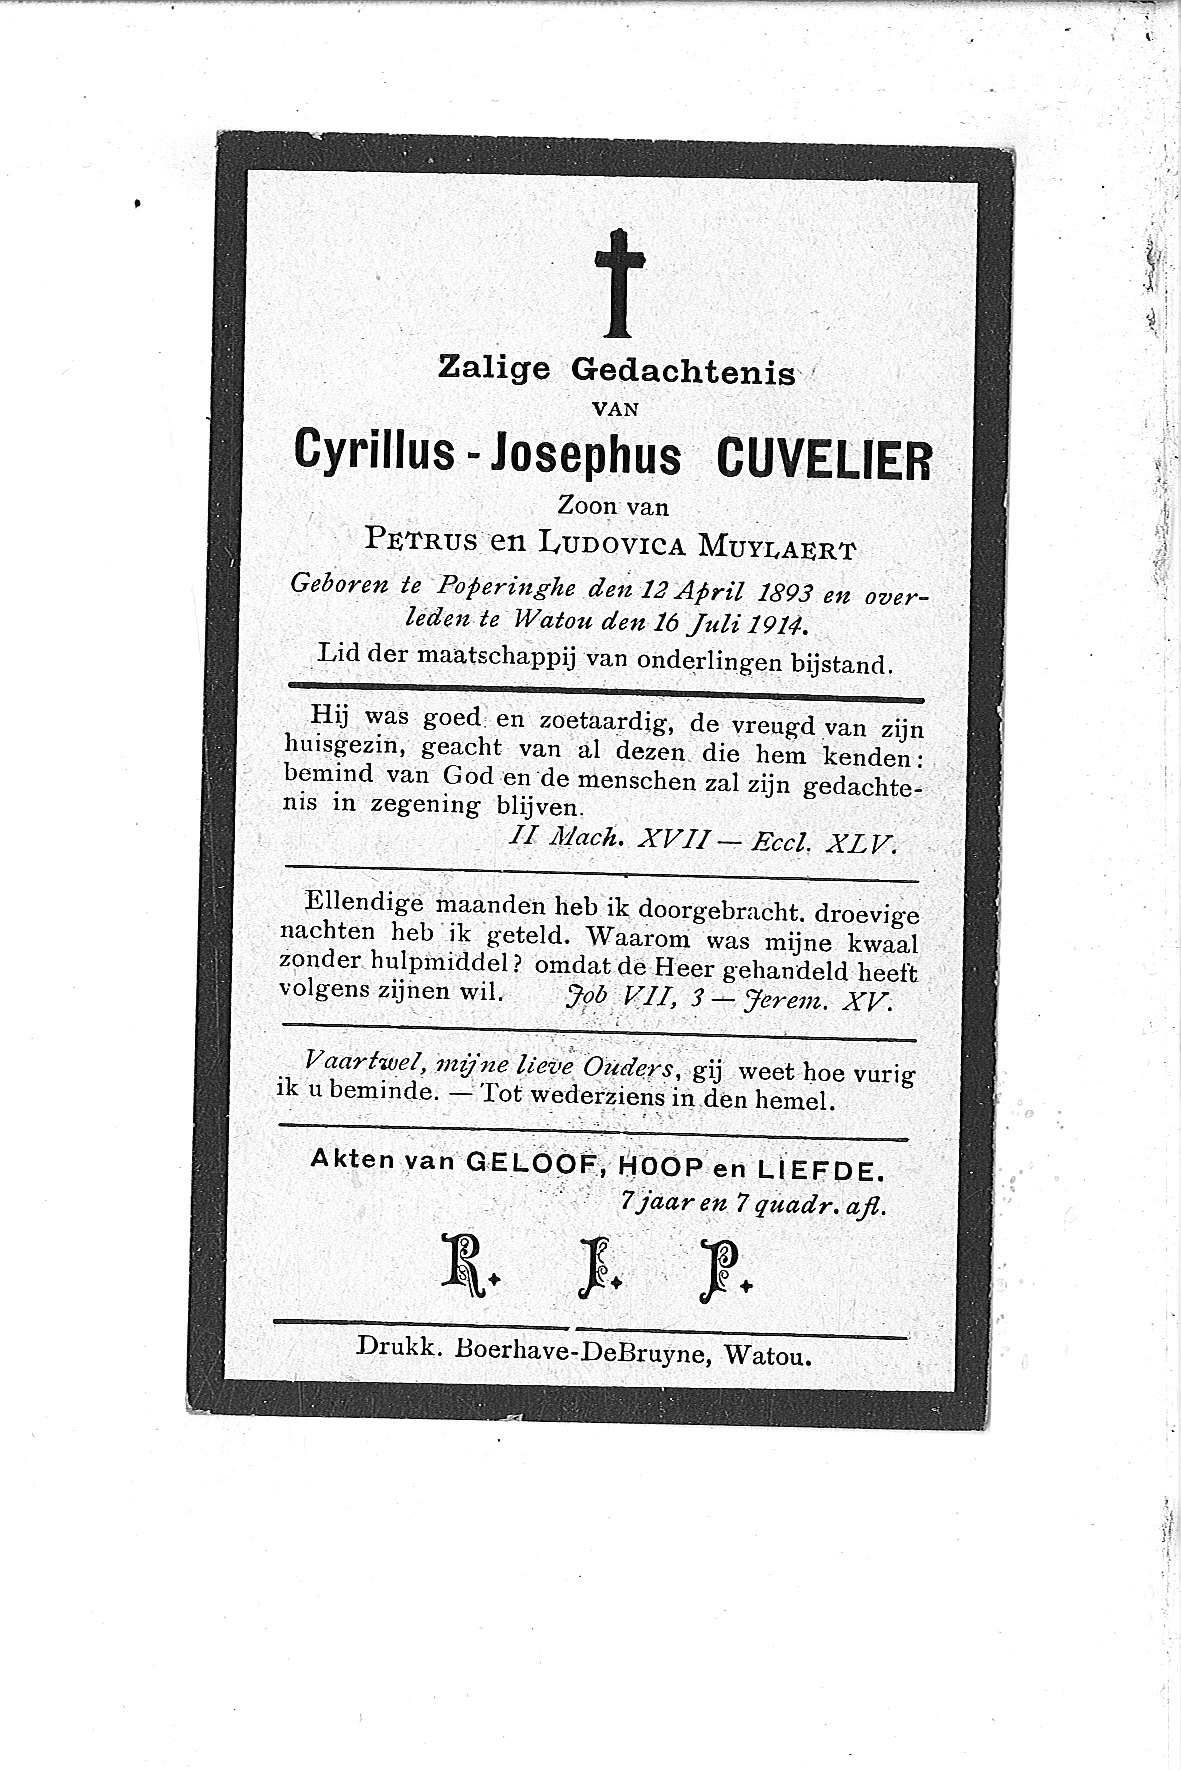 Cyrillus-Josephus (1914) 20120117161928_00198.jpg